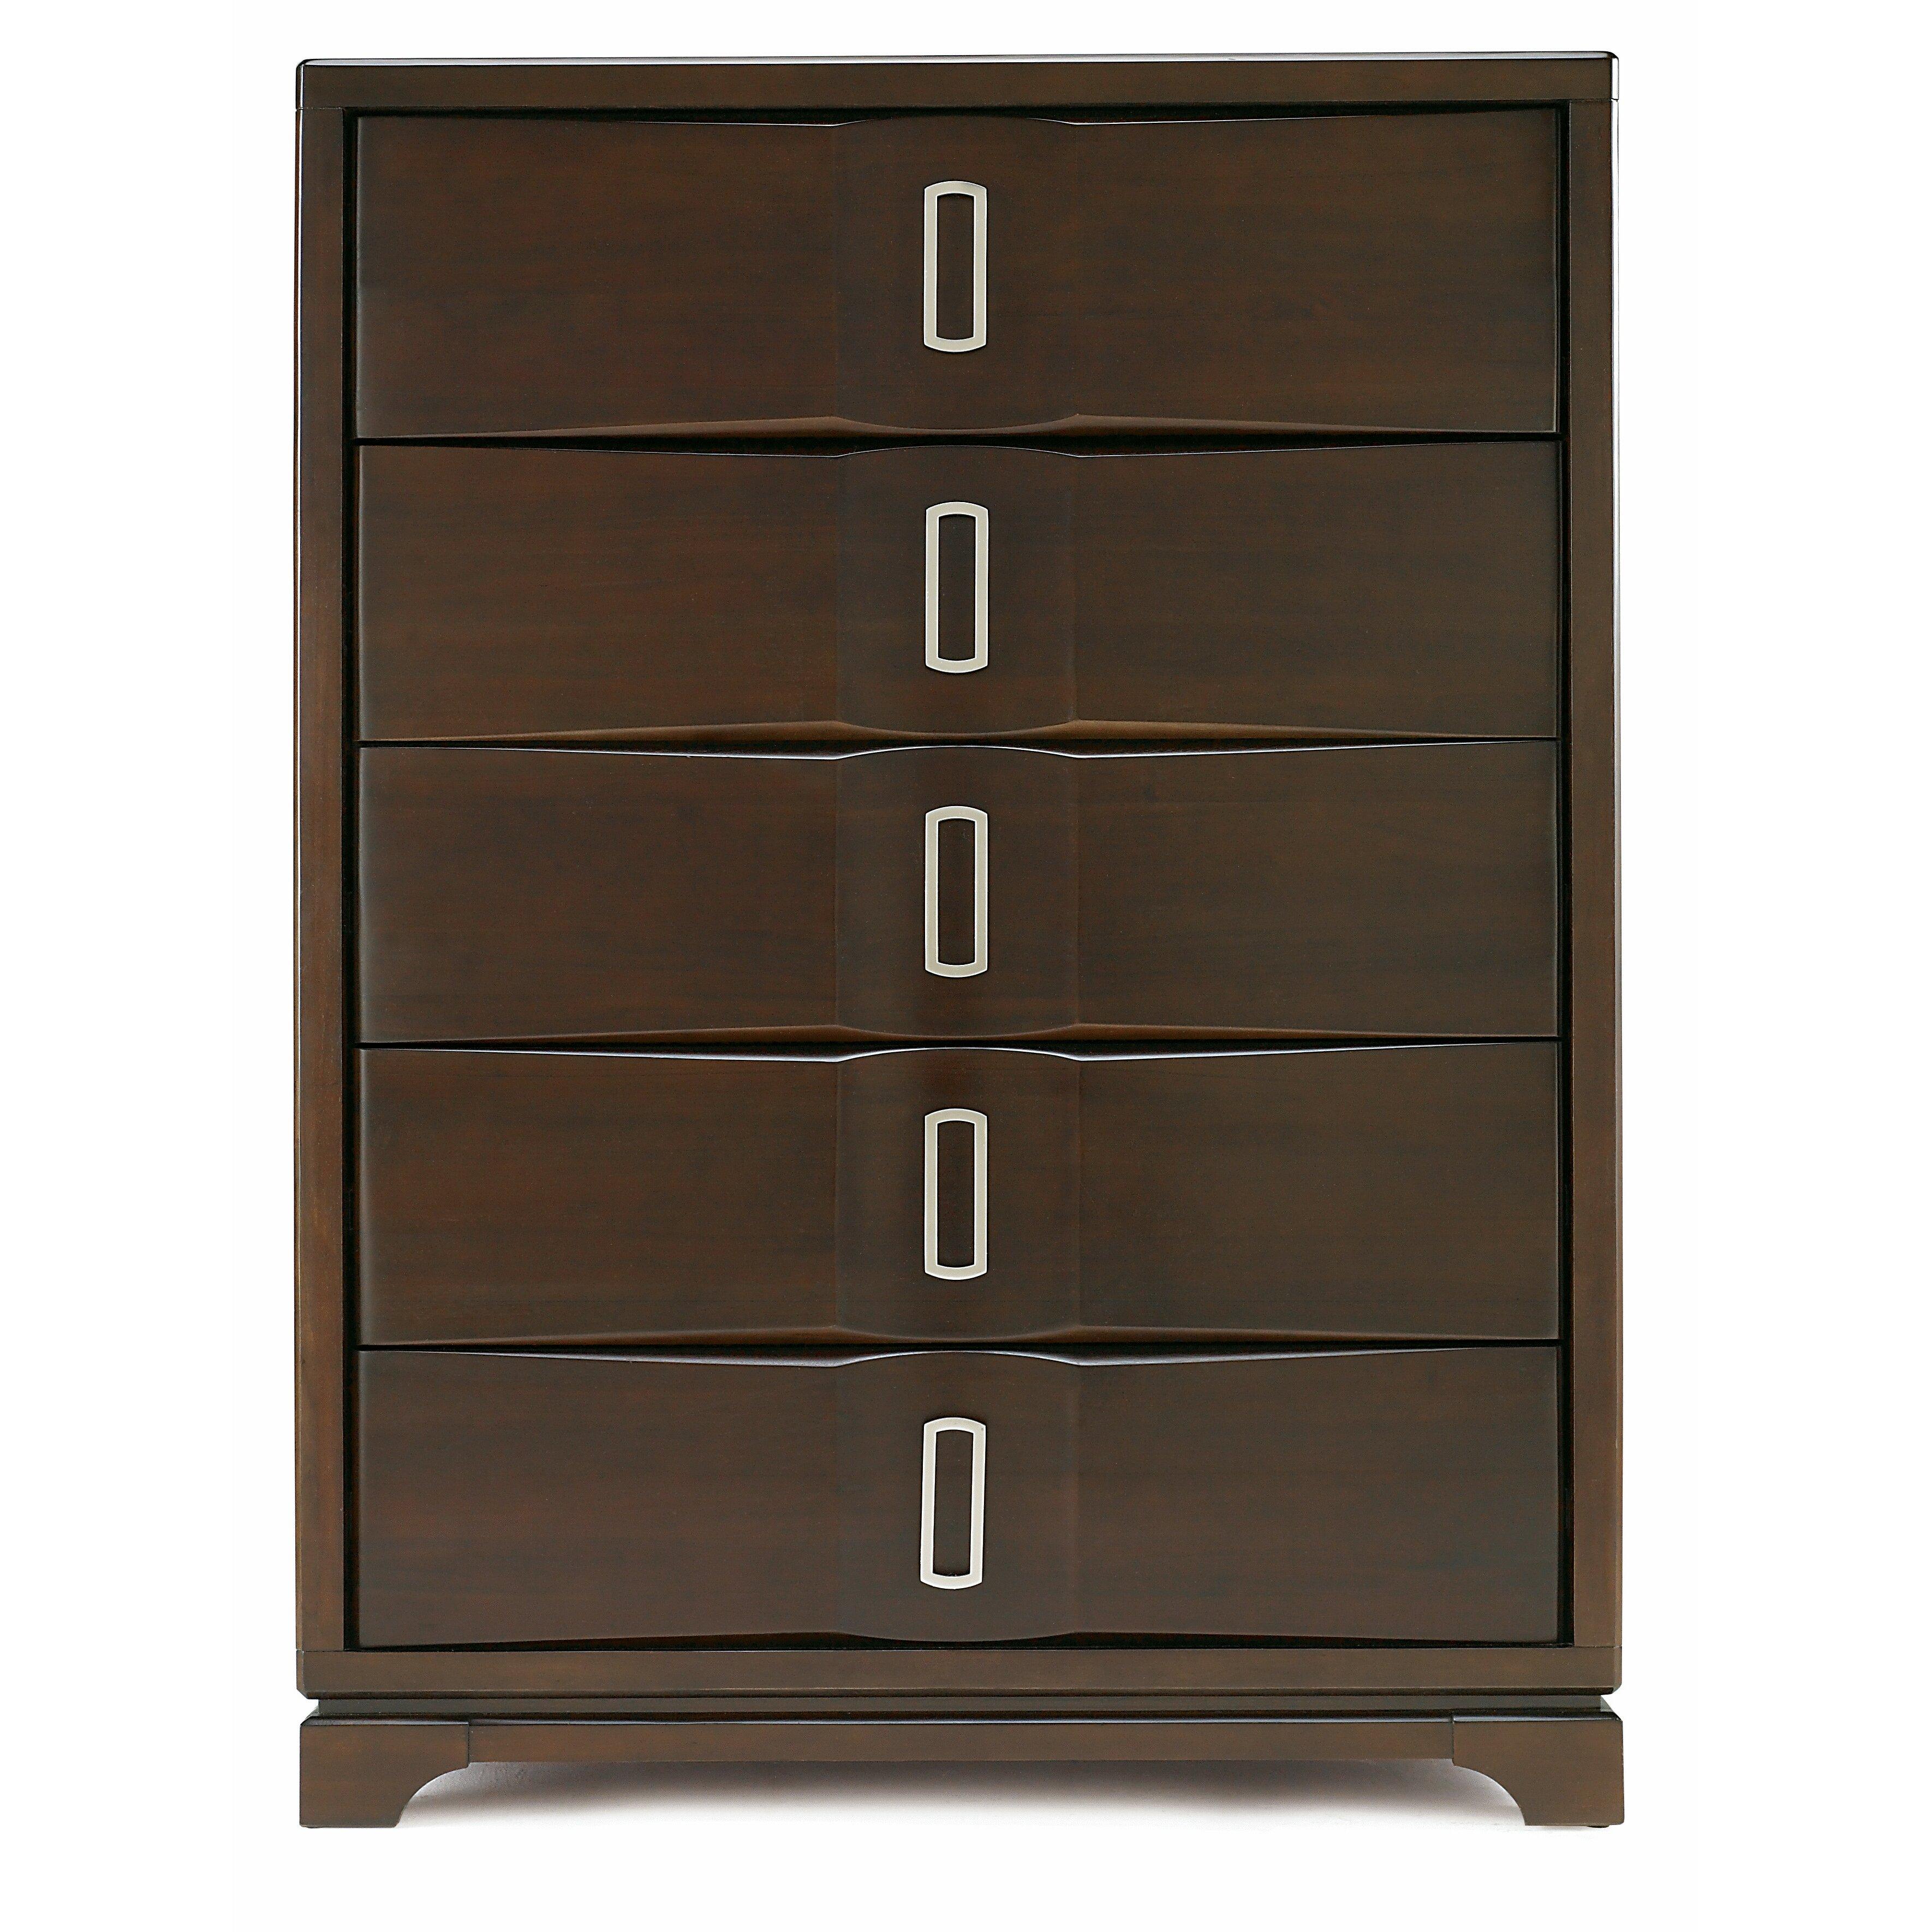 casana furniture company brooke 5 drawer chest wayfair